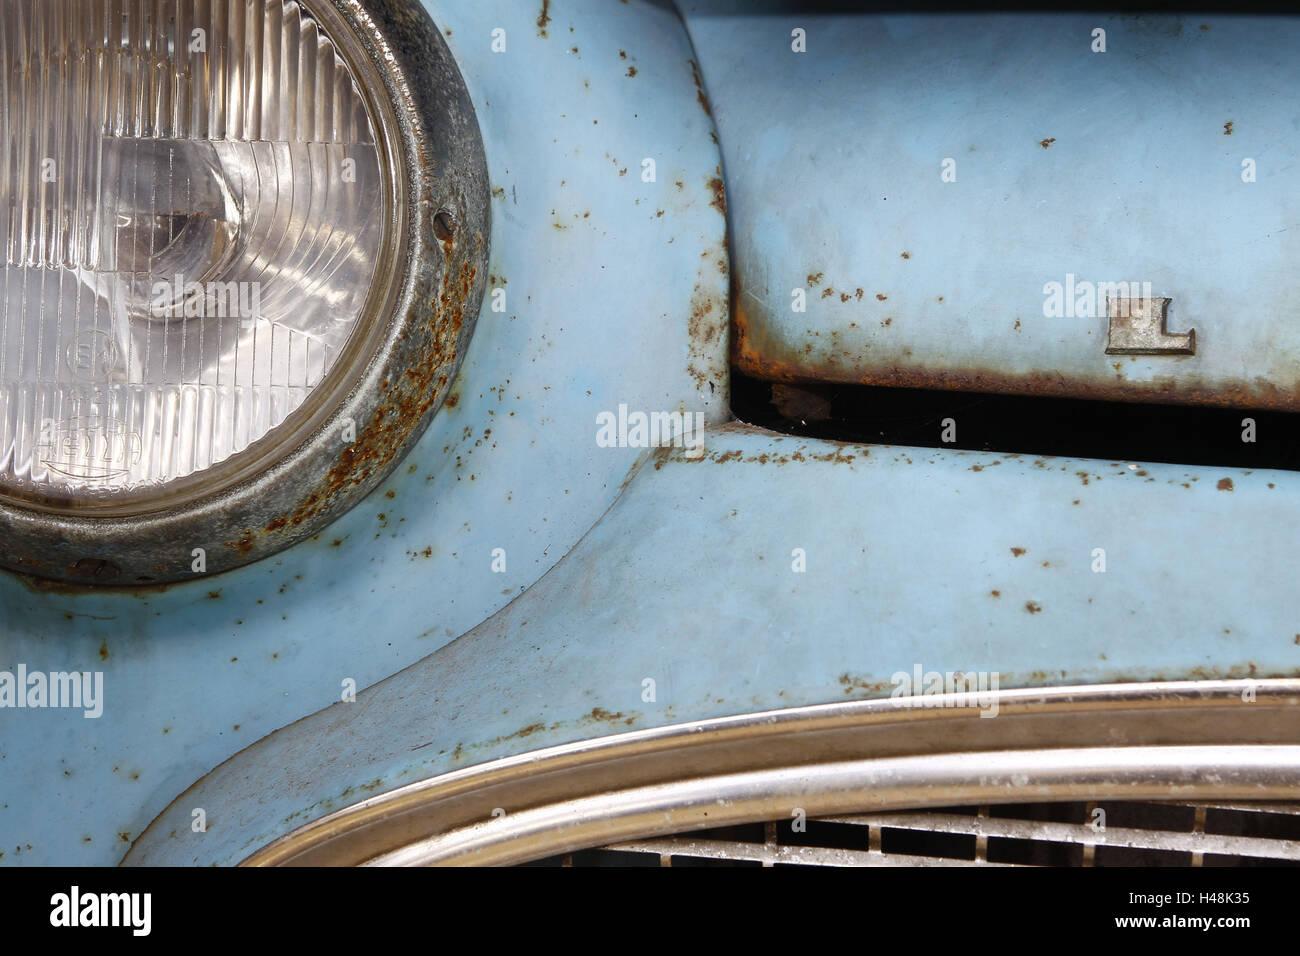 Auto, Detail, Scheinwerfer, Lloyd Oldtimer, hell blau, Rost, mittlere Nahaufnahme Stockbild